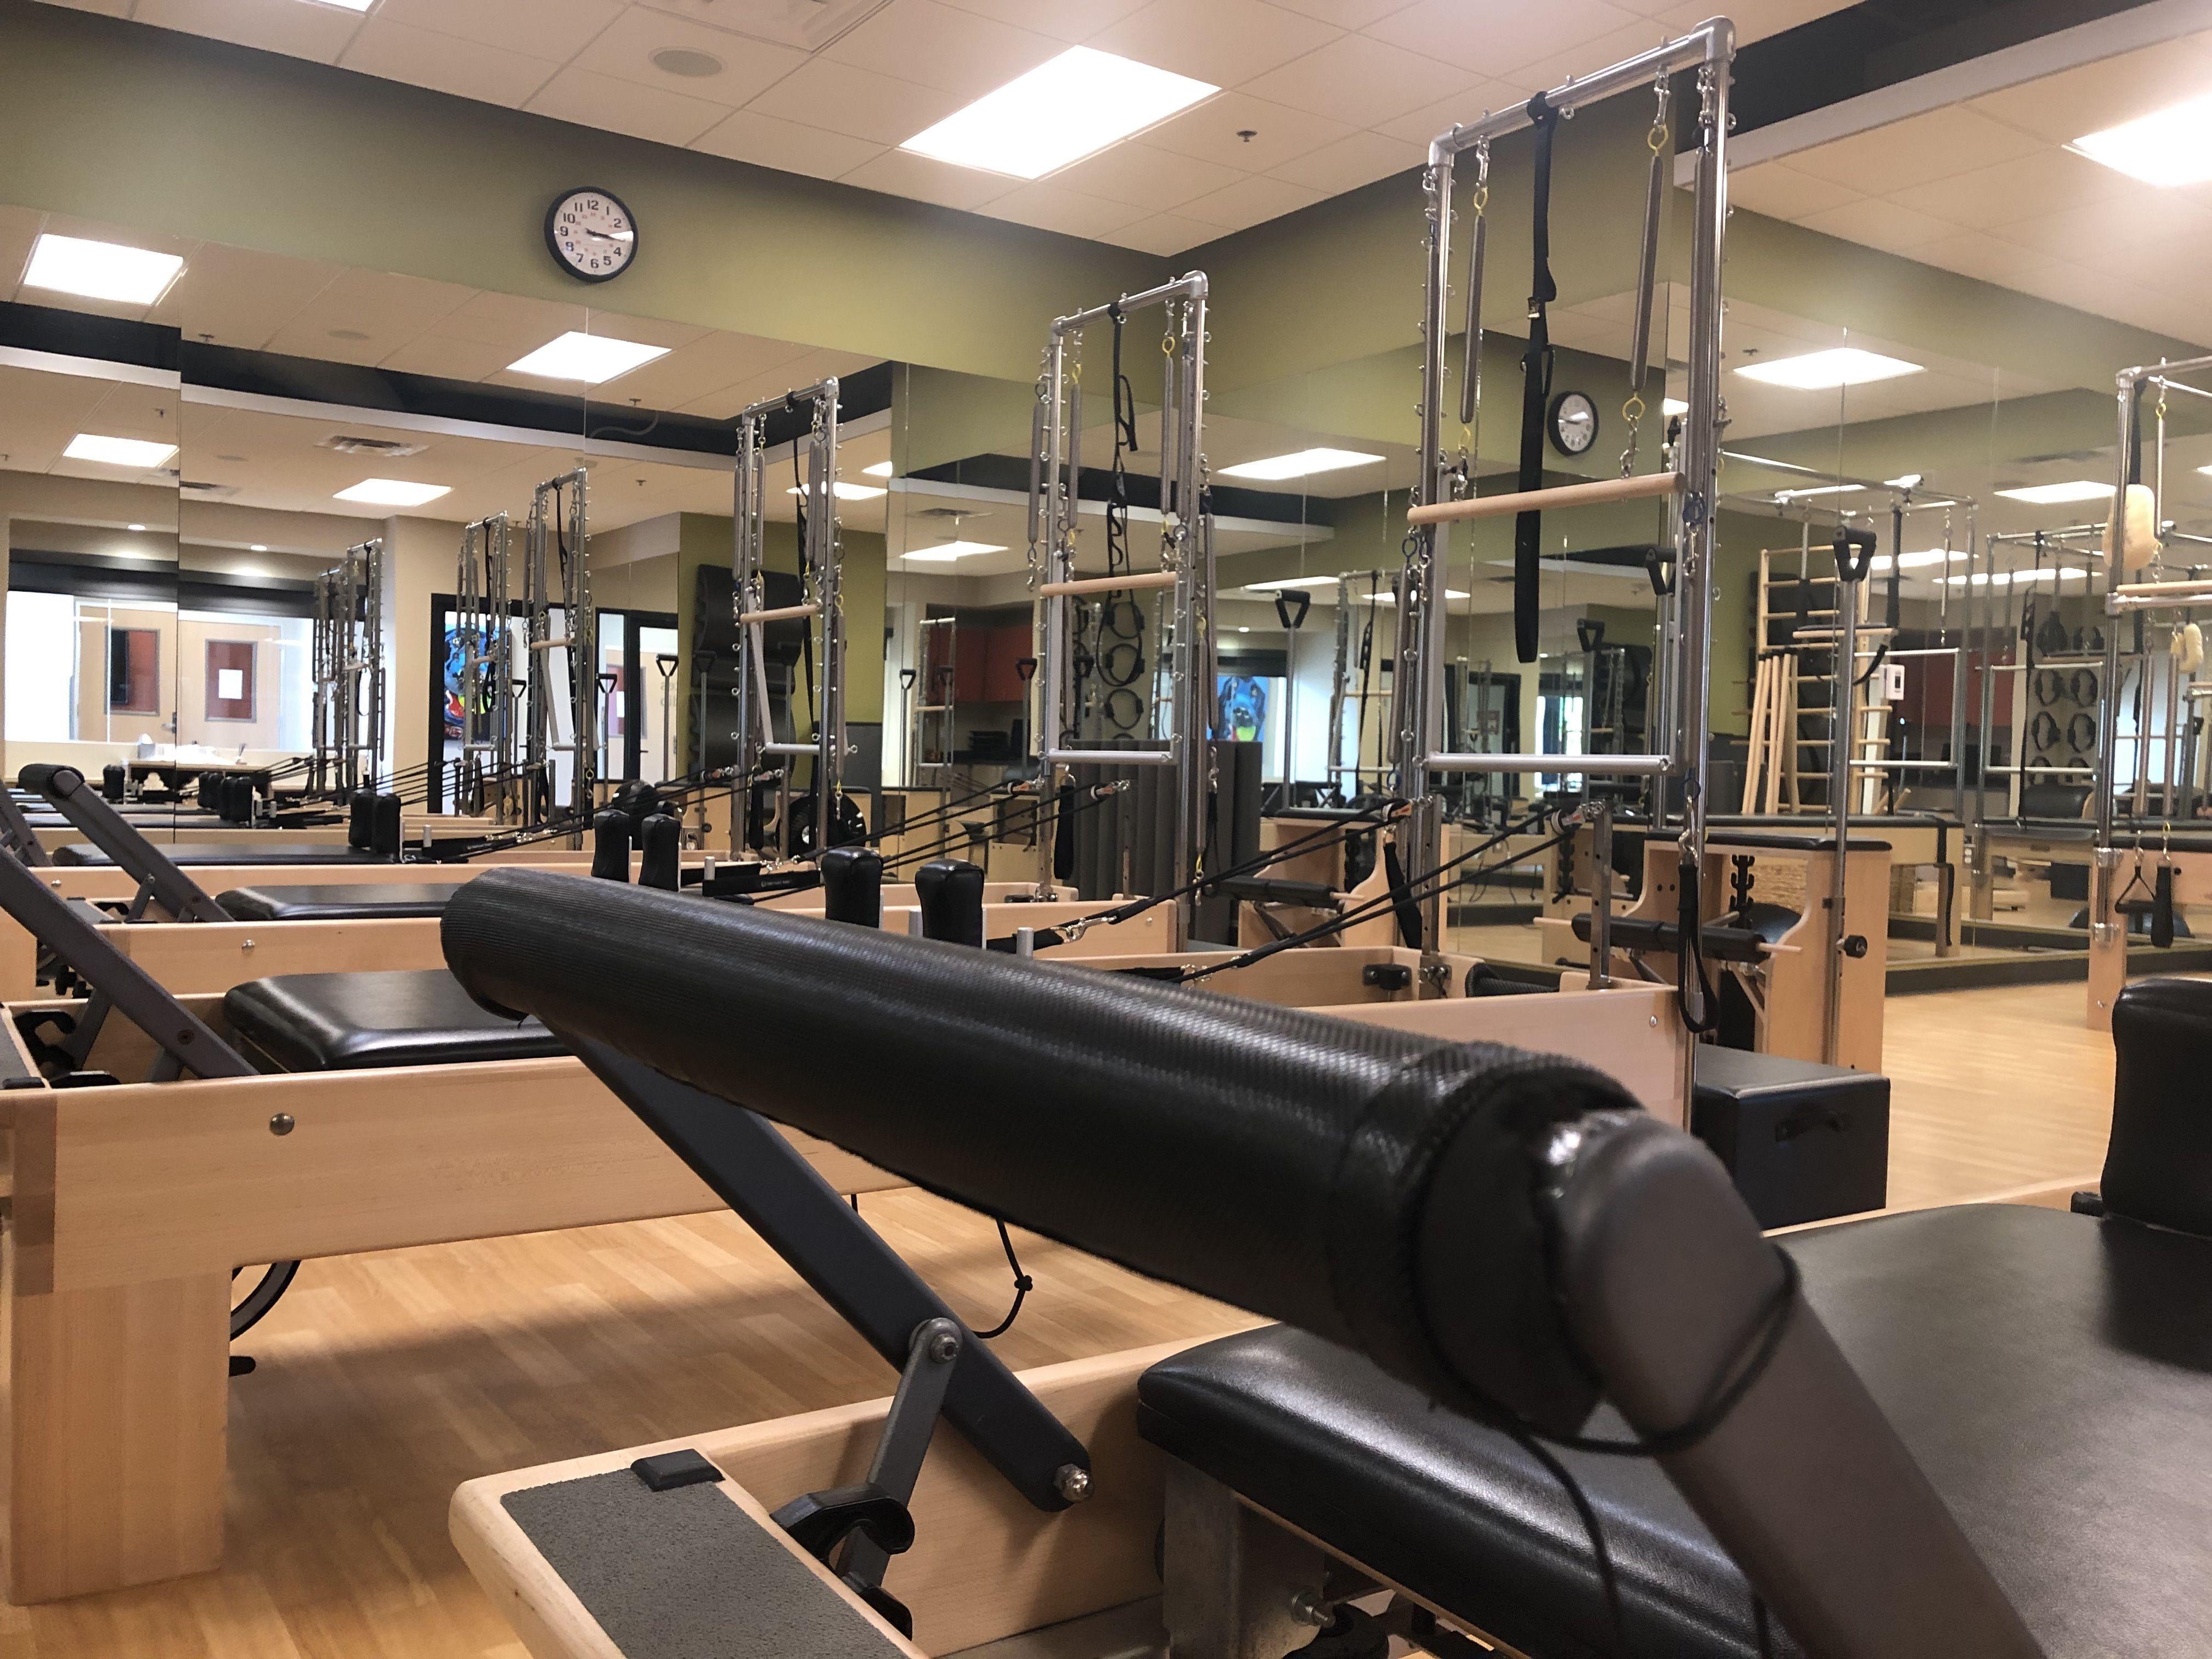 Village Pilates Pilates Pilatesreformer Pilates Reformer Muscular Endurance Pilates Benefits